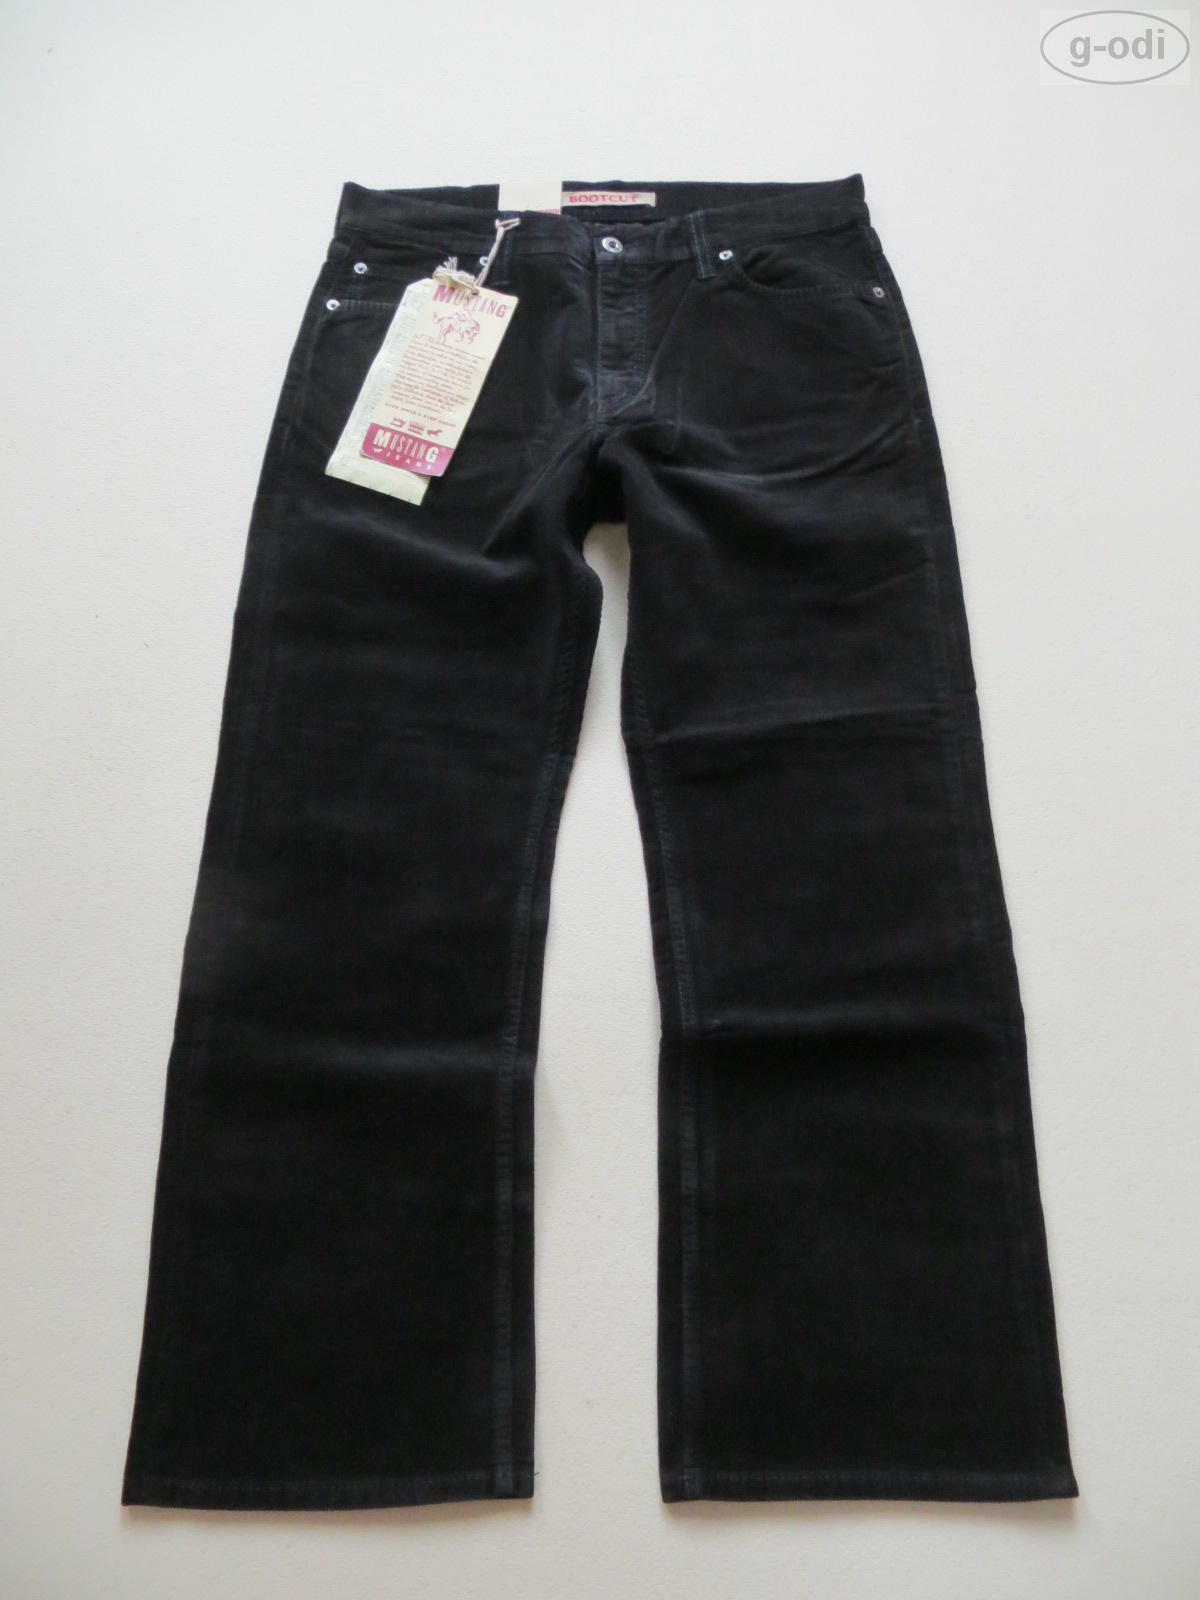 Mustang Stiefelcut Cord Jeans Hose W 34  L 30 schwarz NEU   Stretch Cordhose RAR